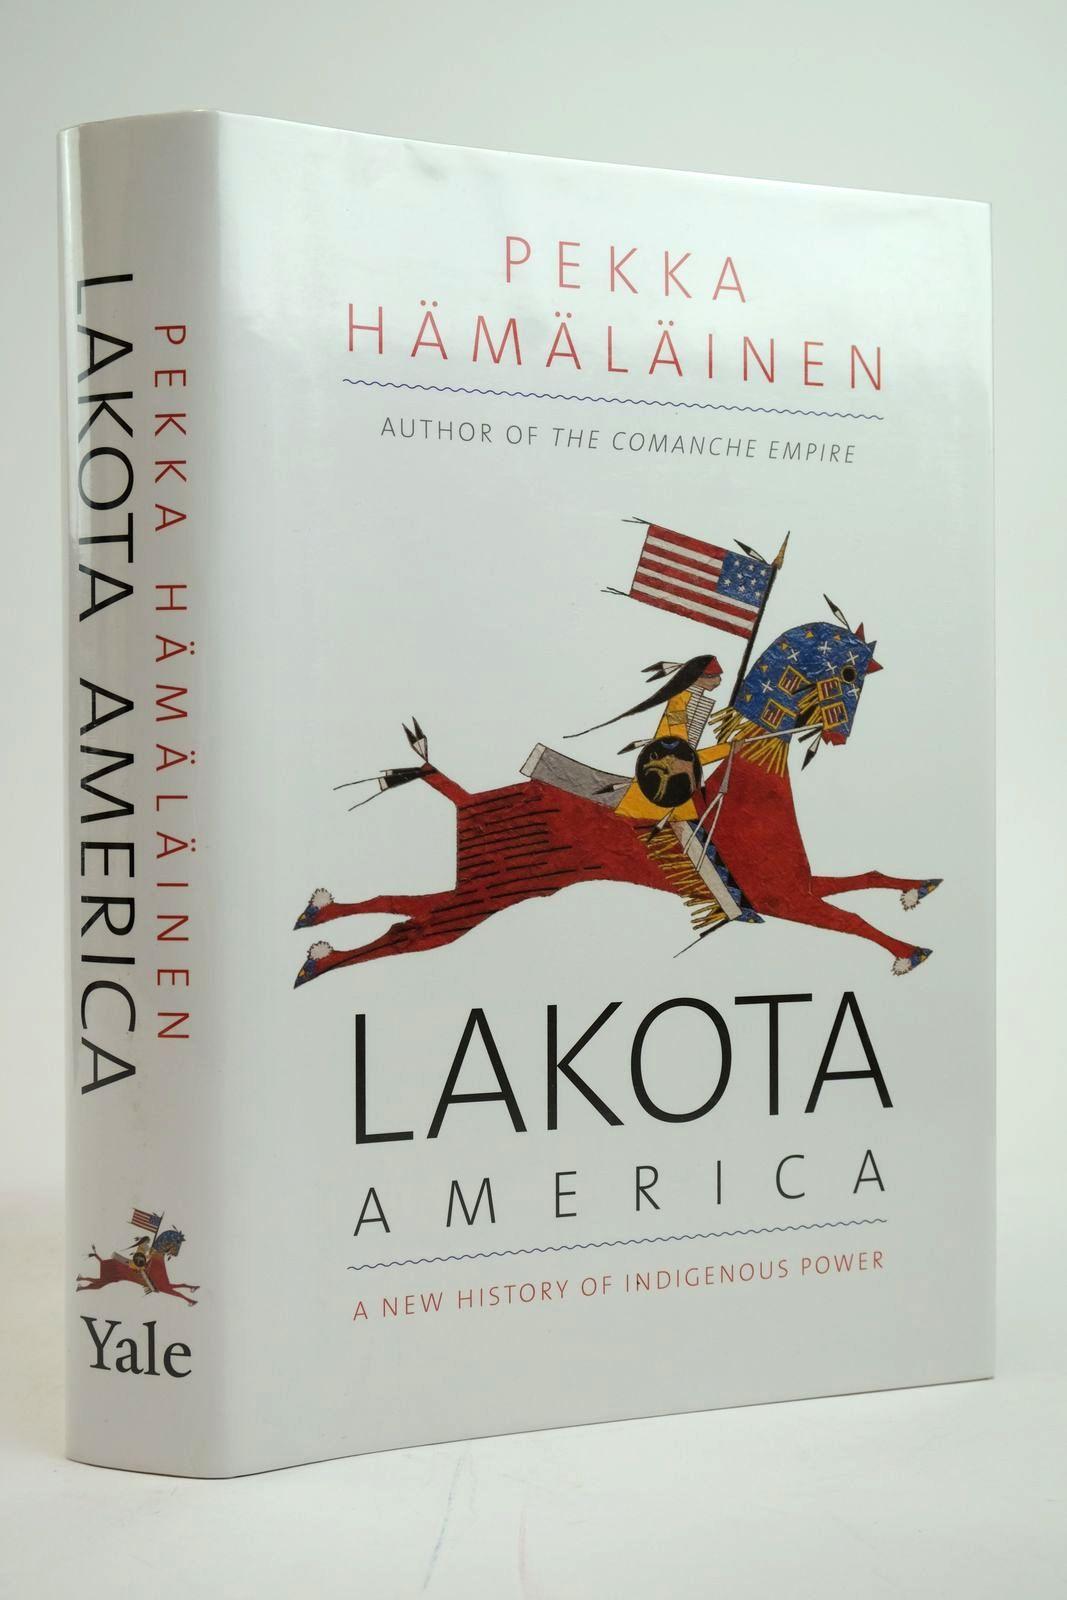 Photo of LAKOTA AMERICA: A NEW HISTORY OF INDIGENOUS POWER written by Hamalainen, Pekka published by Yale University Press (STOCK CODE: 2135268)  for sale by Stella & Rose's Books